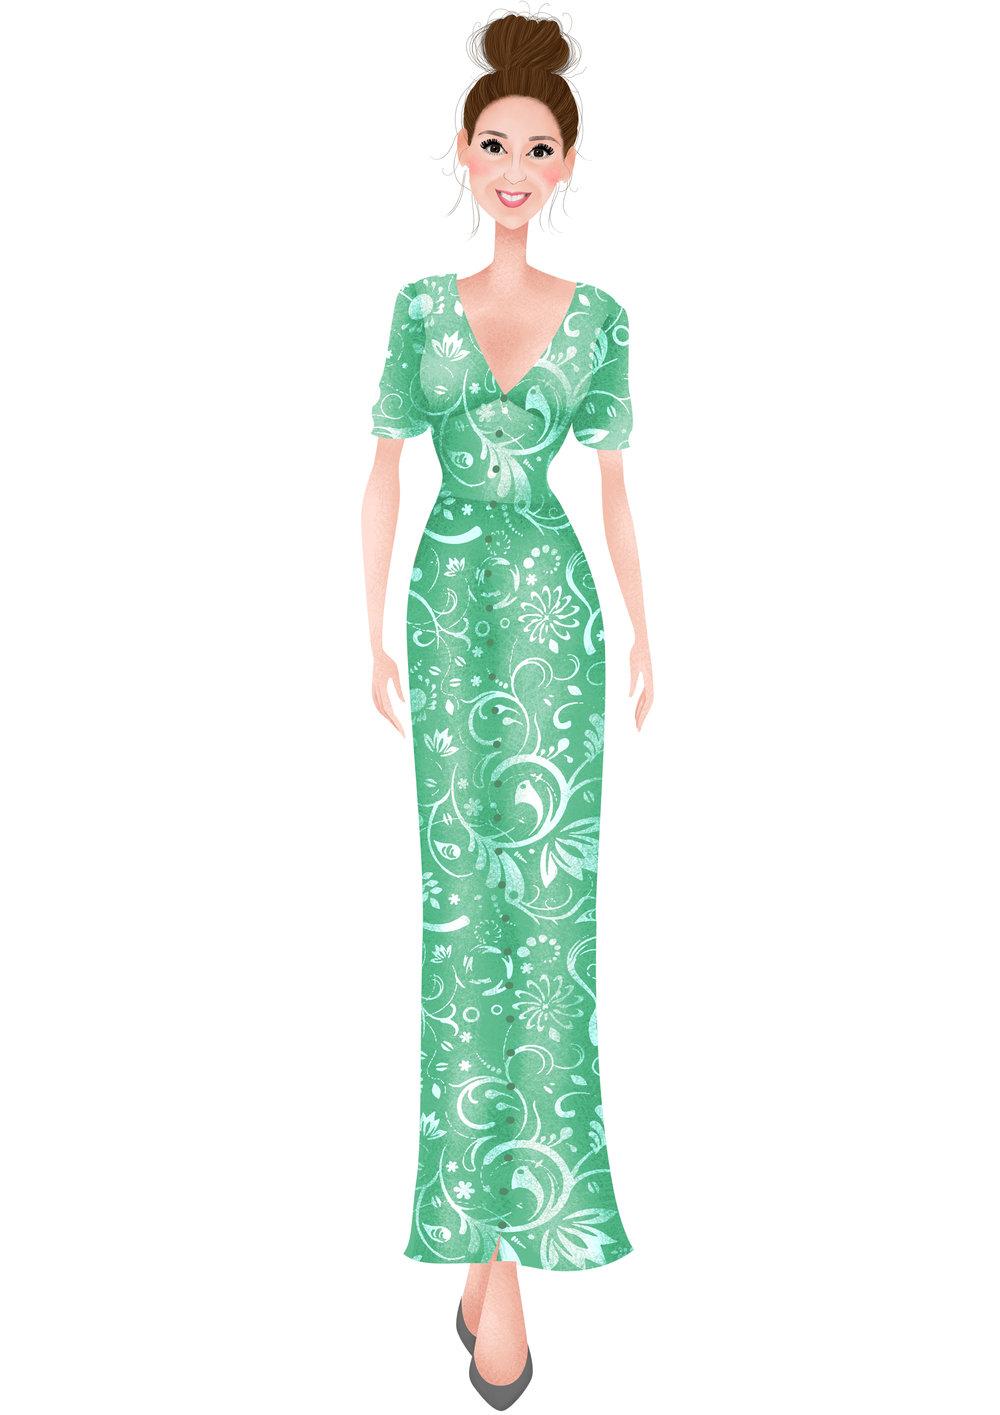 Green Floral, Maxi Tea Dress by ASOS